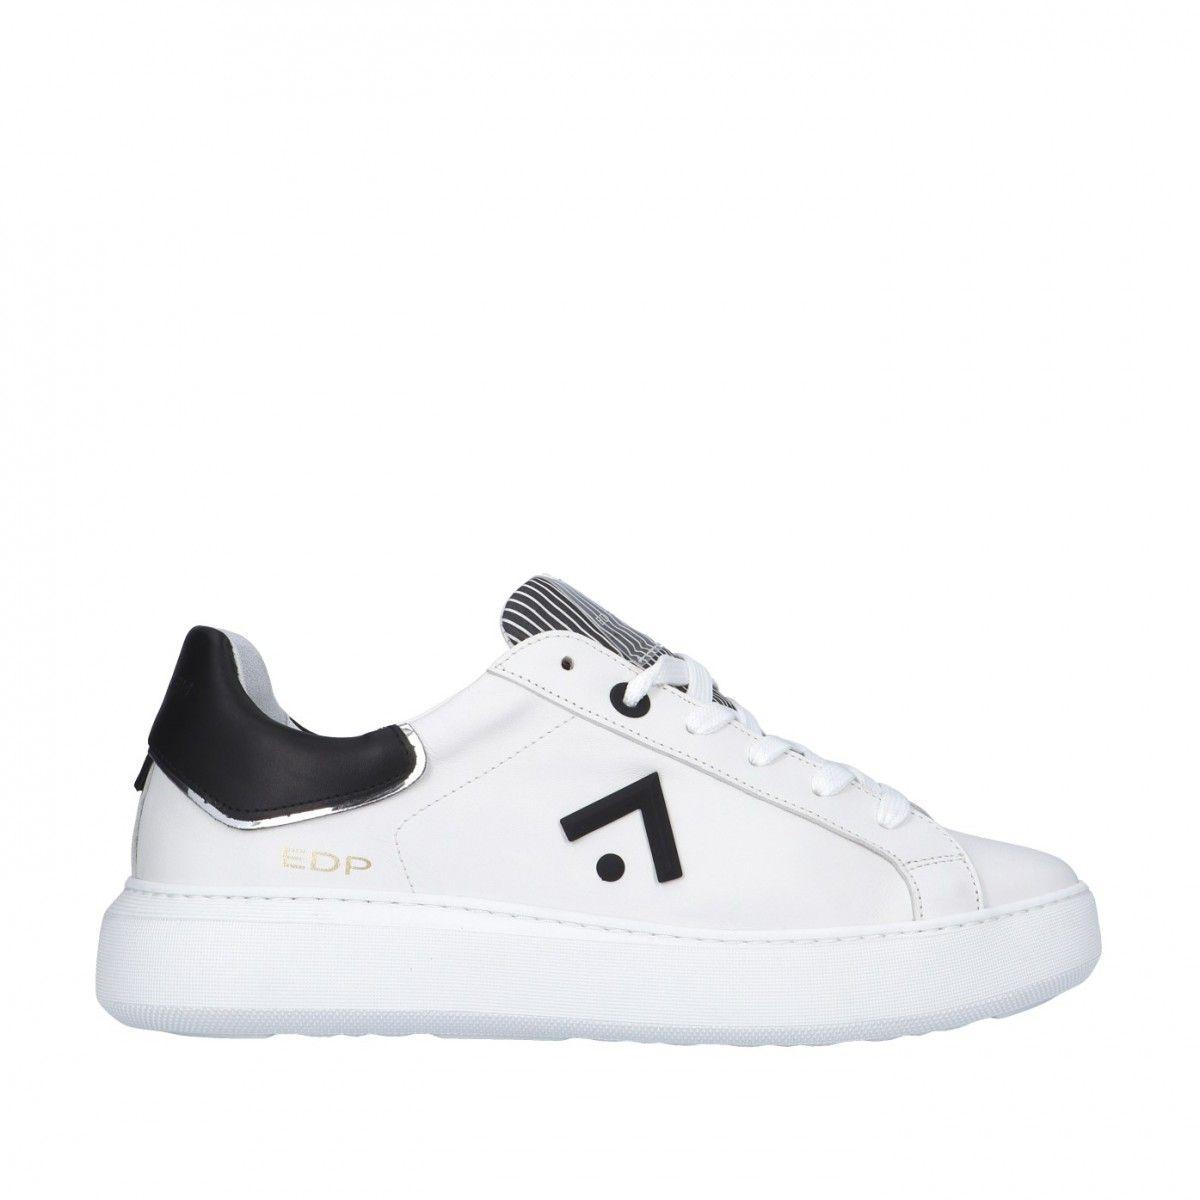 Ed parrish Sneaker Bianco/nero Gomma CKLU-VT03